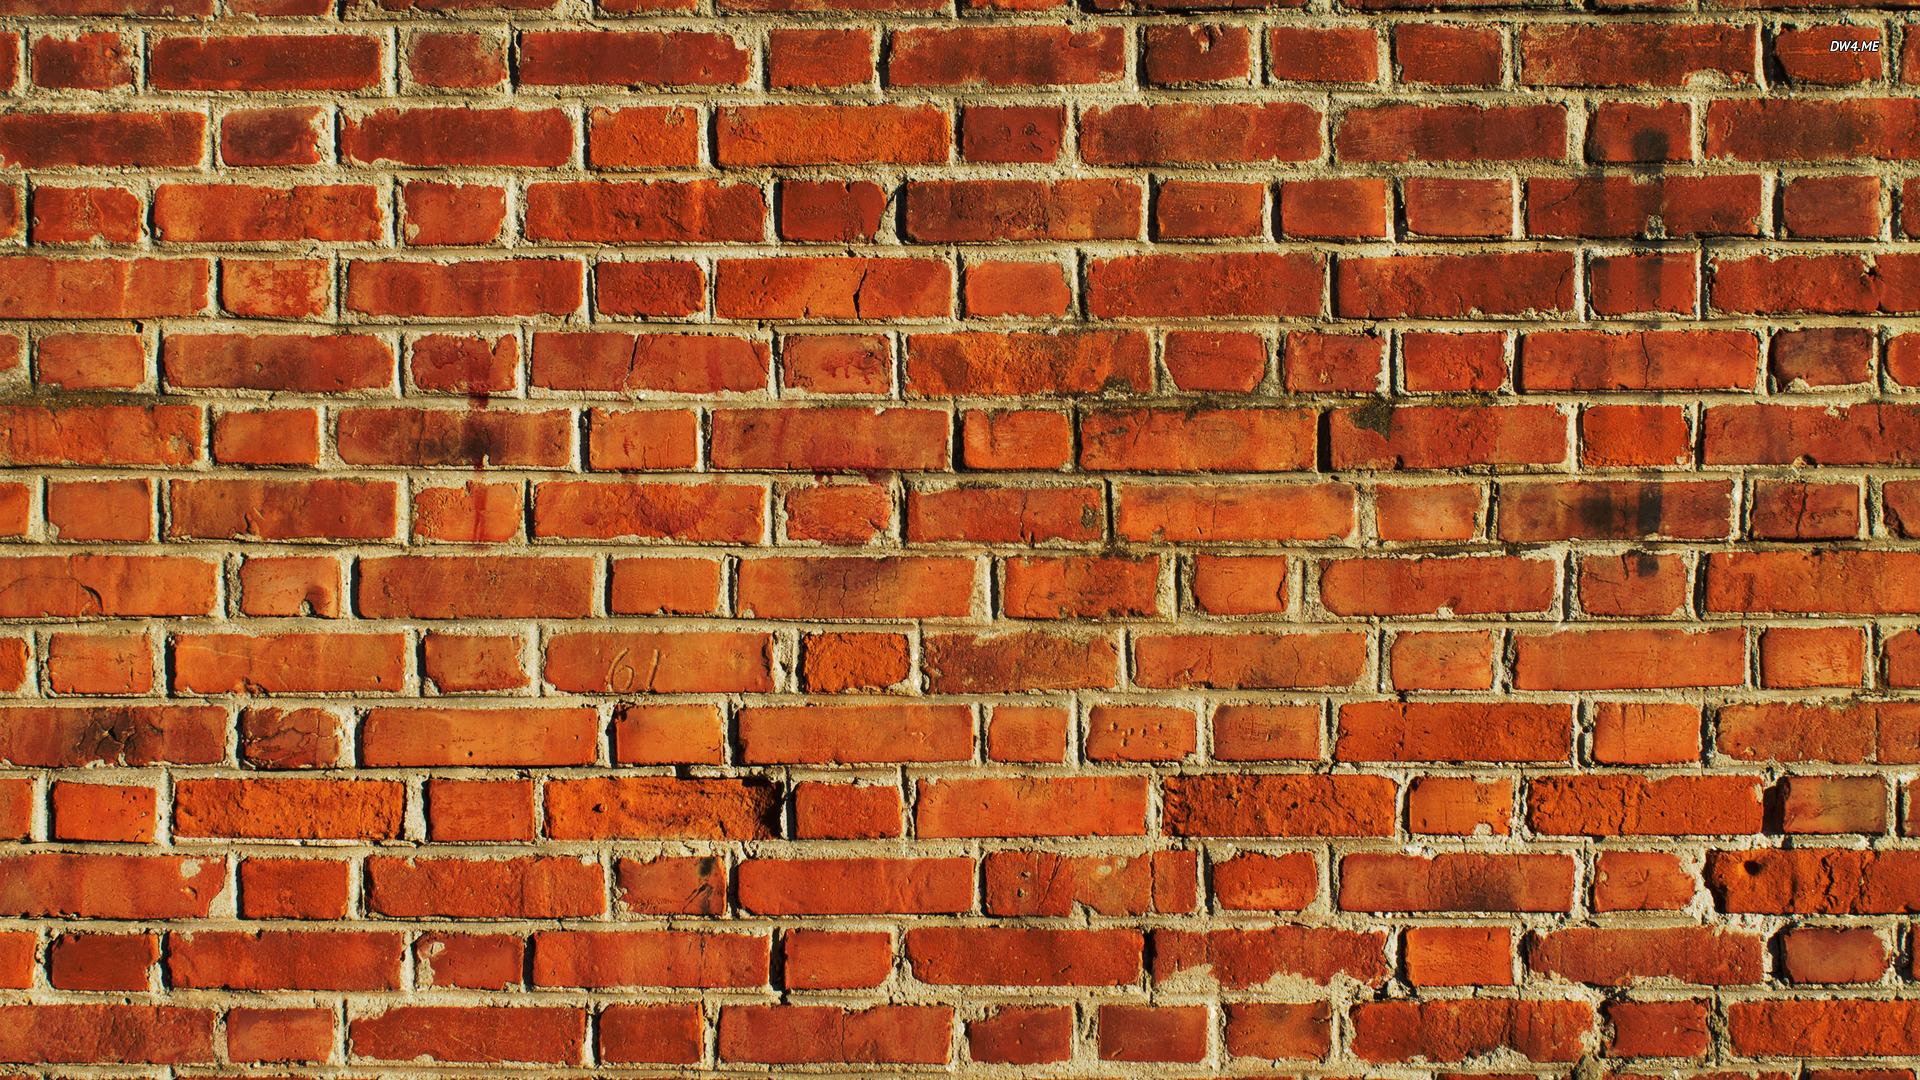 Free Brick Wallpaper Cliparts, Download Free Clip Art, Free.